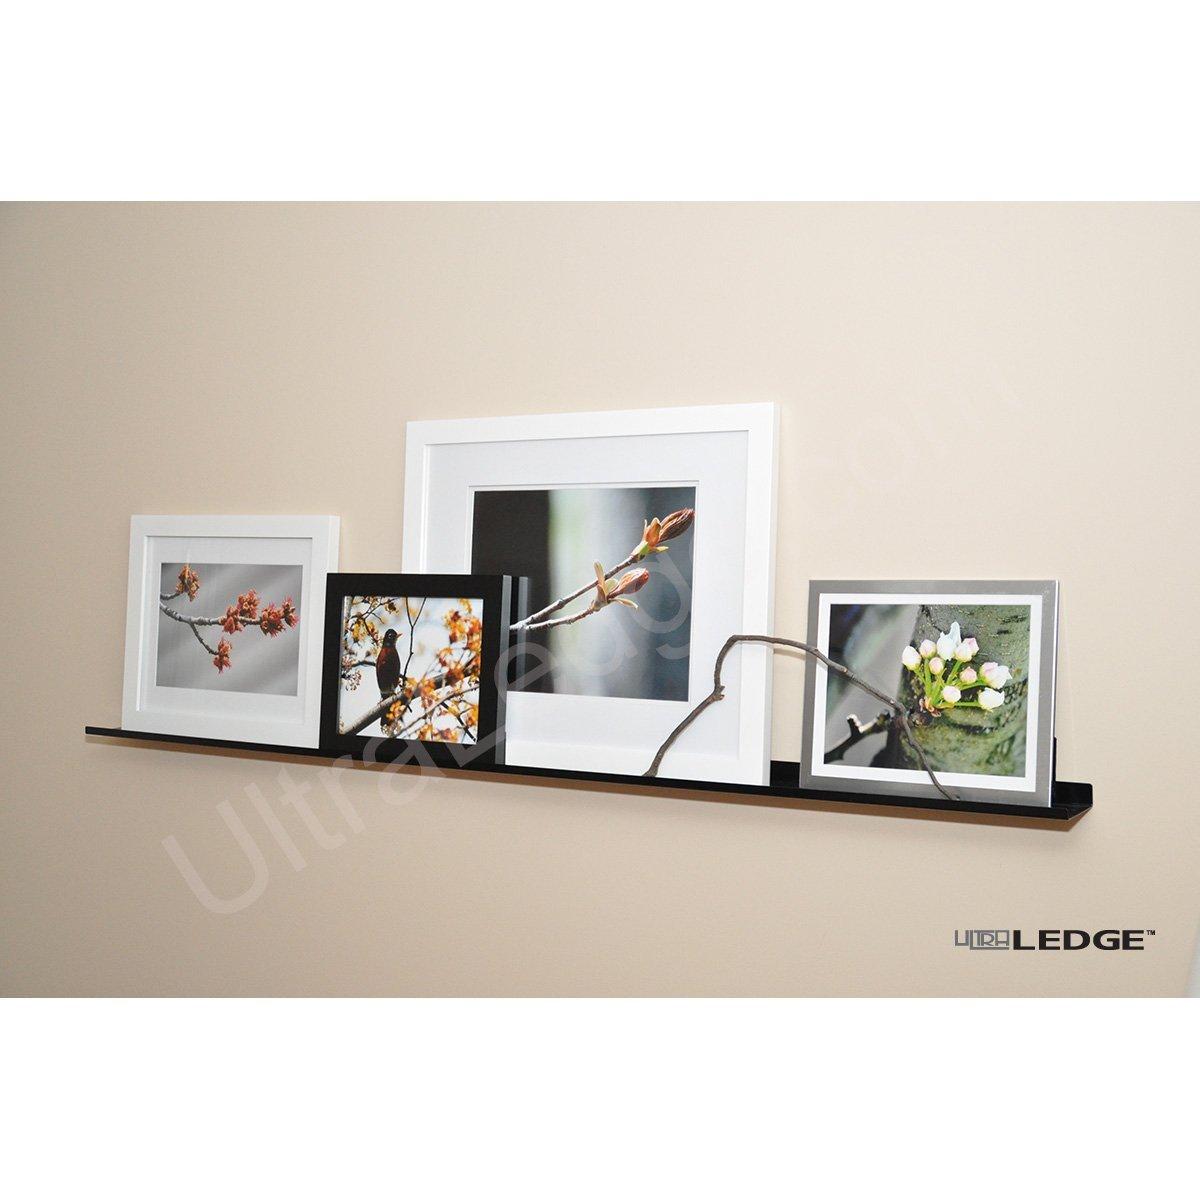 "5'/60"" UltraLedge Art Display / Picture Ledge / Floating Shelf, Metal, Modern (3.5"" deep, Black)"